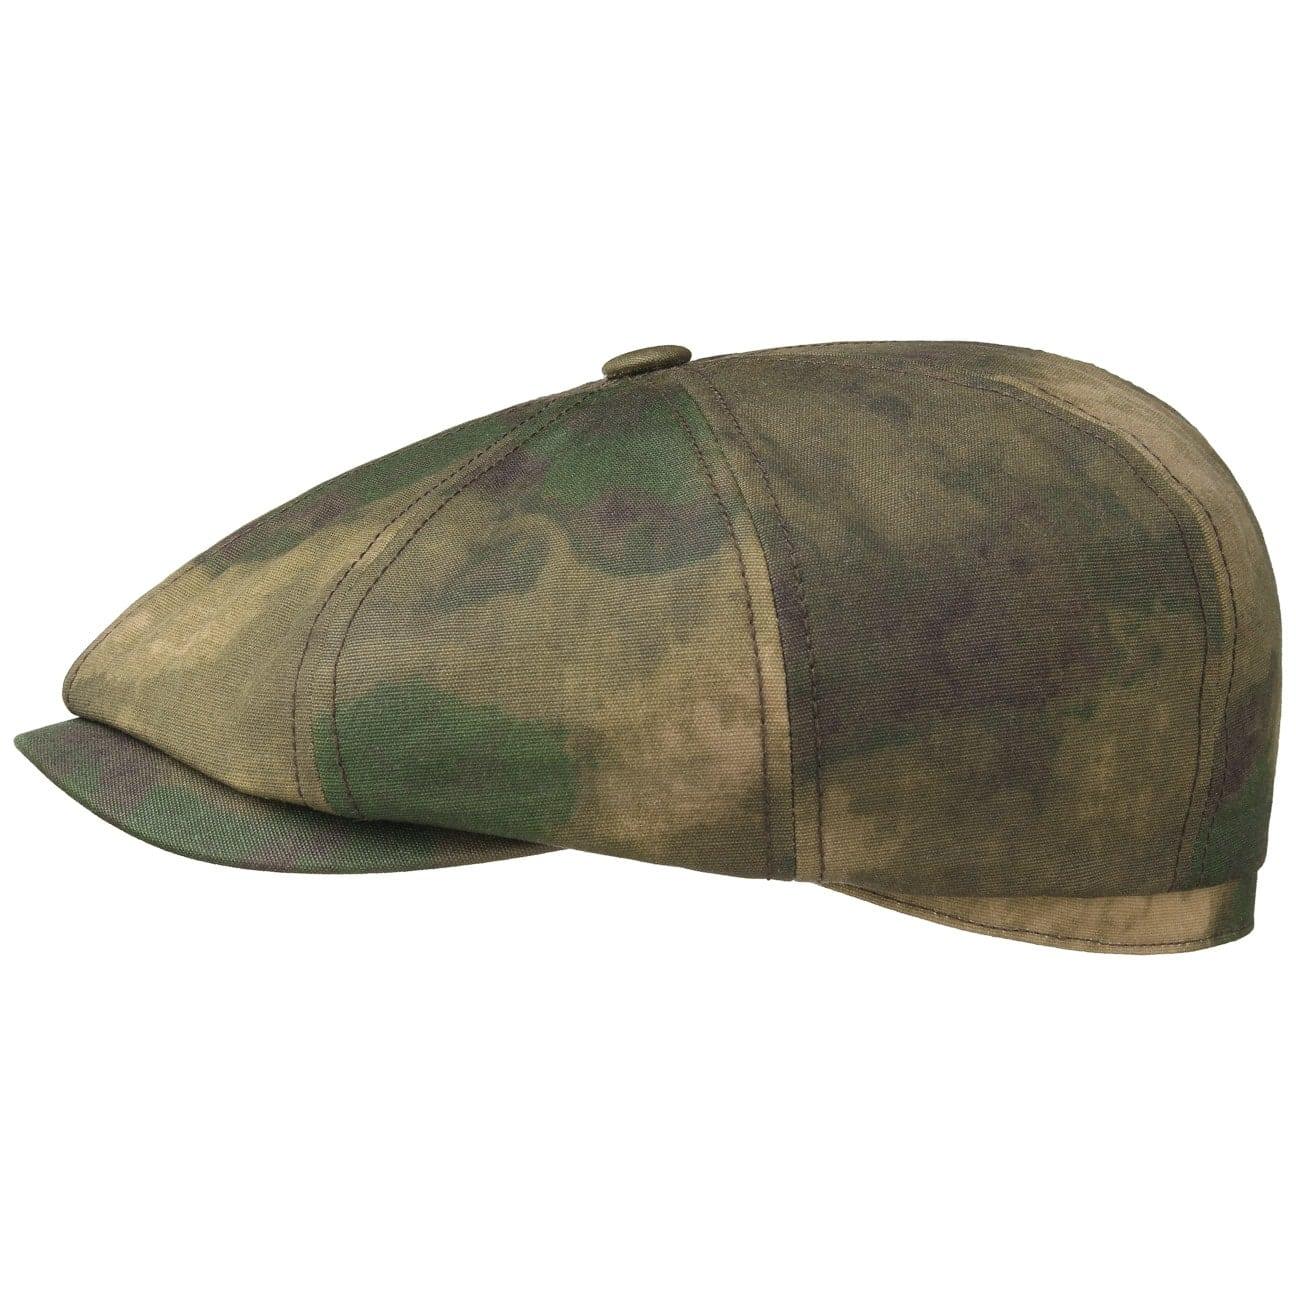 Hatteras Camouflage Flatcap By Stetson 79 00